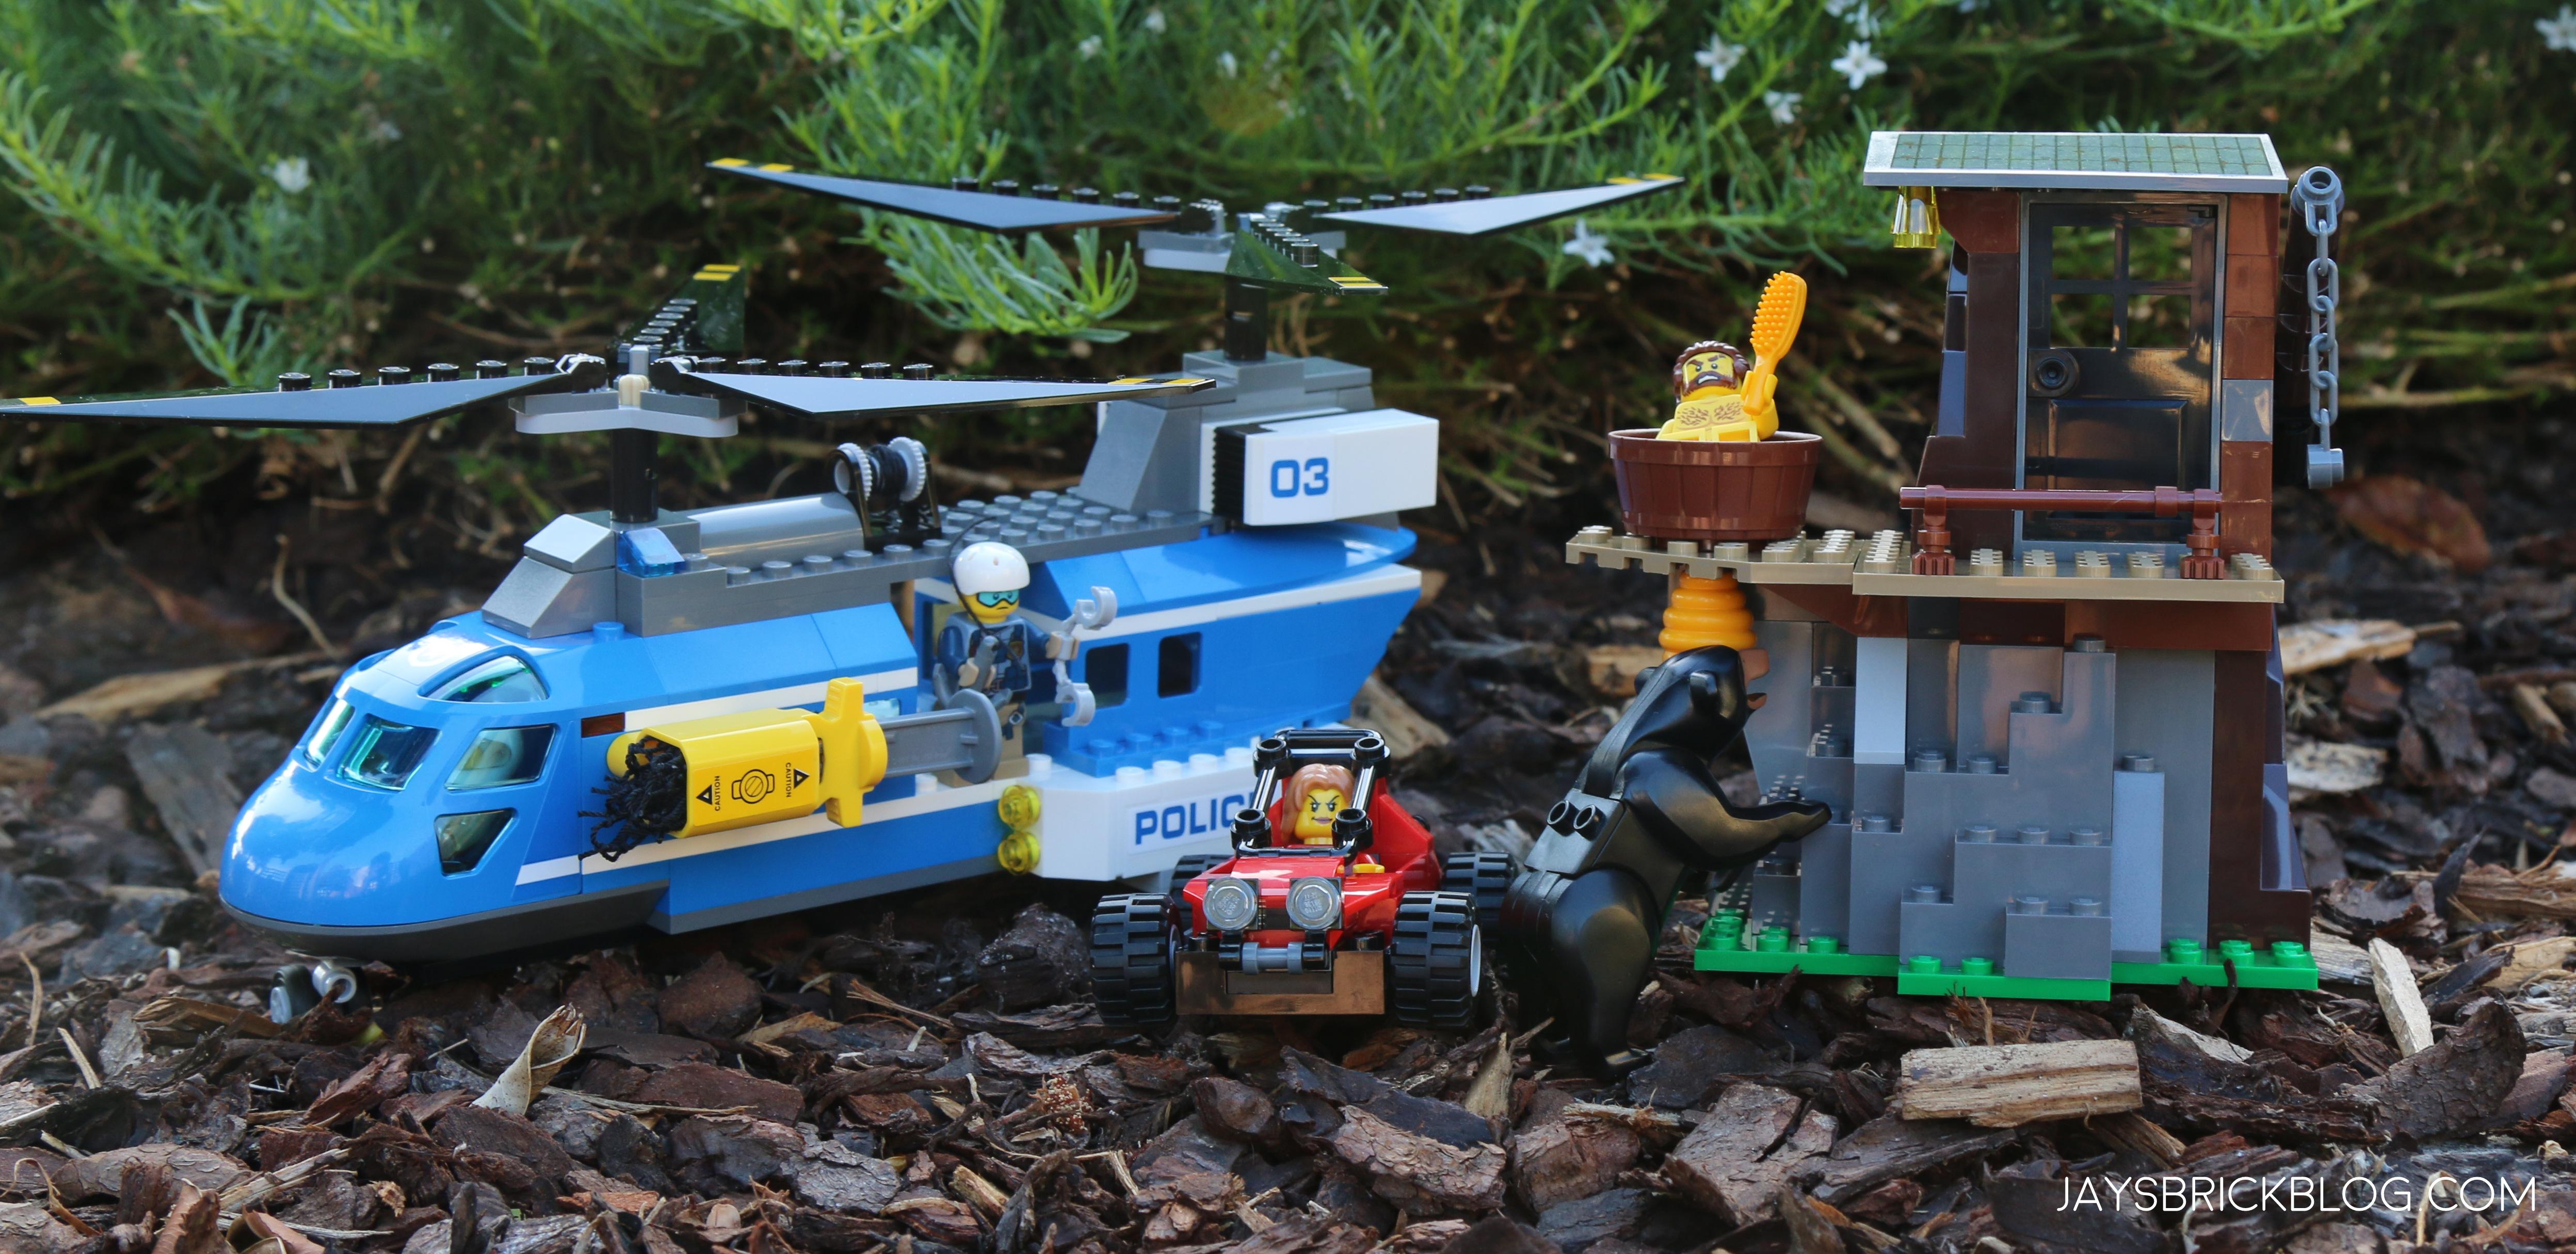 Review: LEGO 60173 Mountain Arrest - Jays Brick Blog